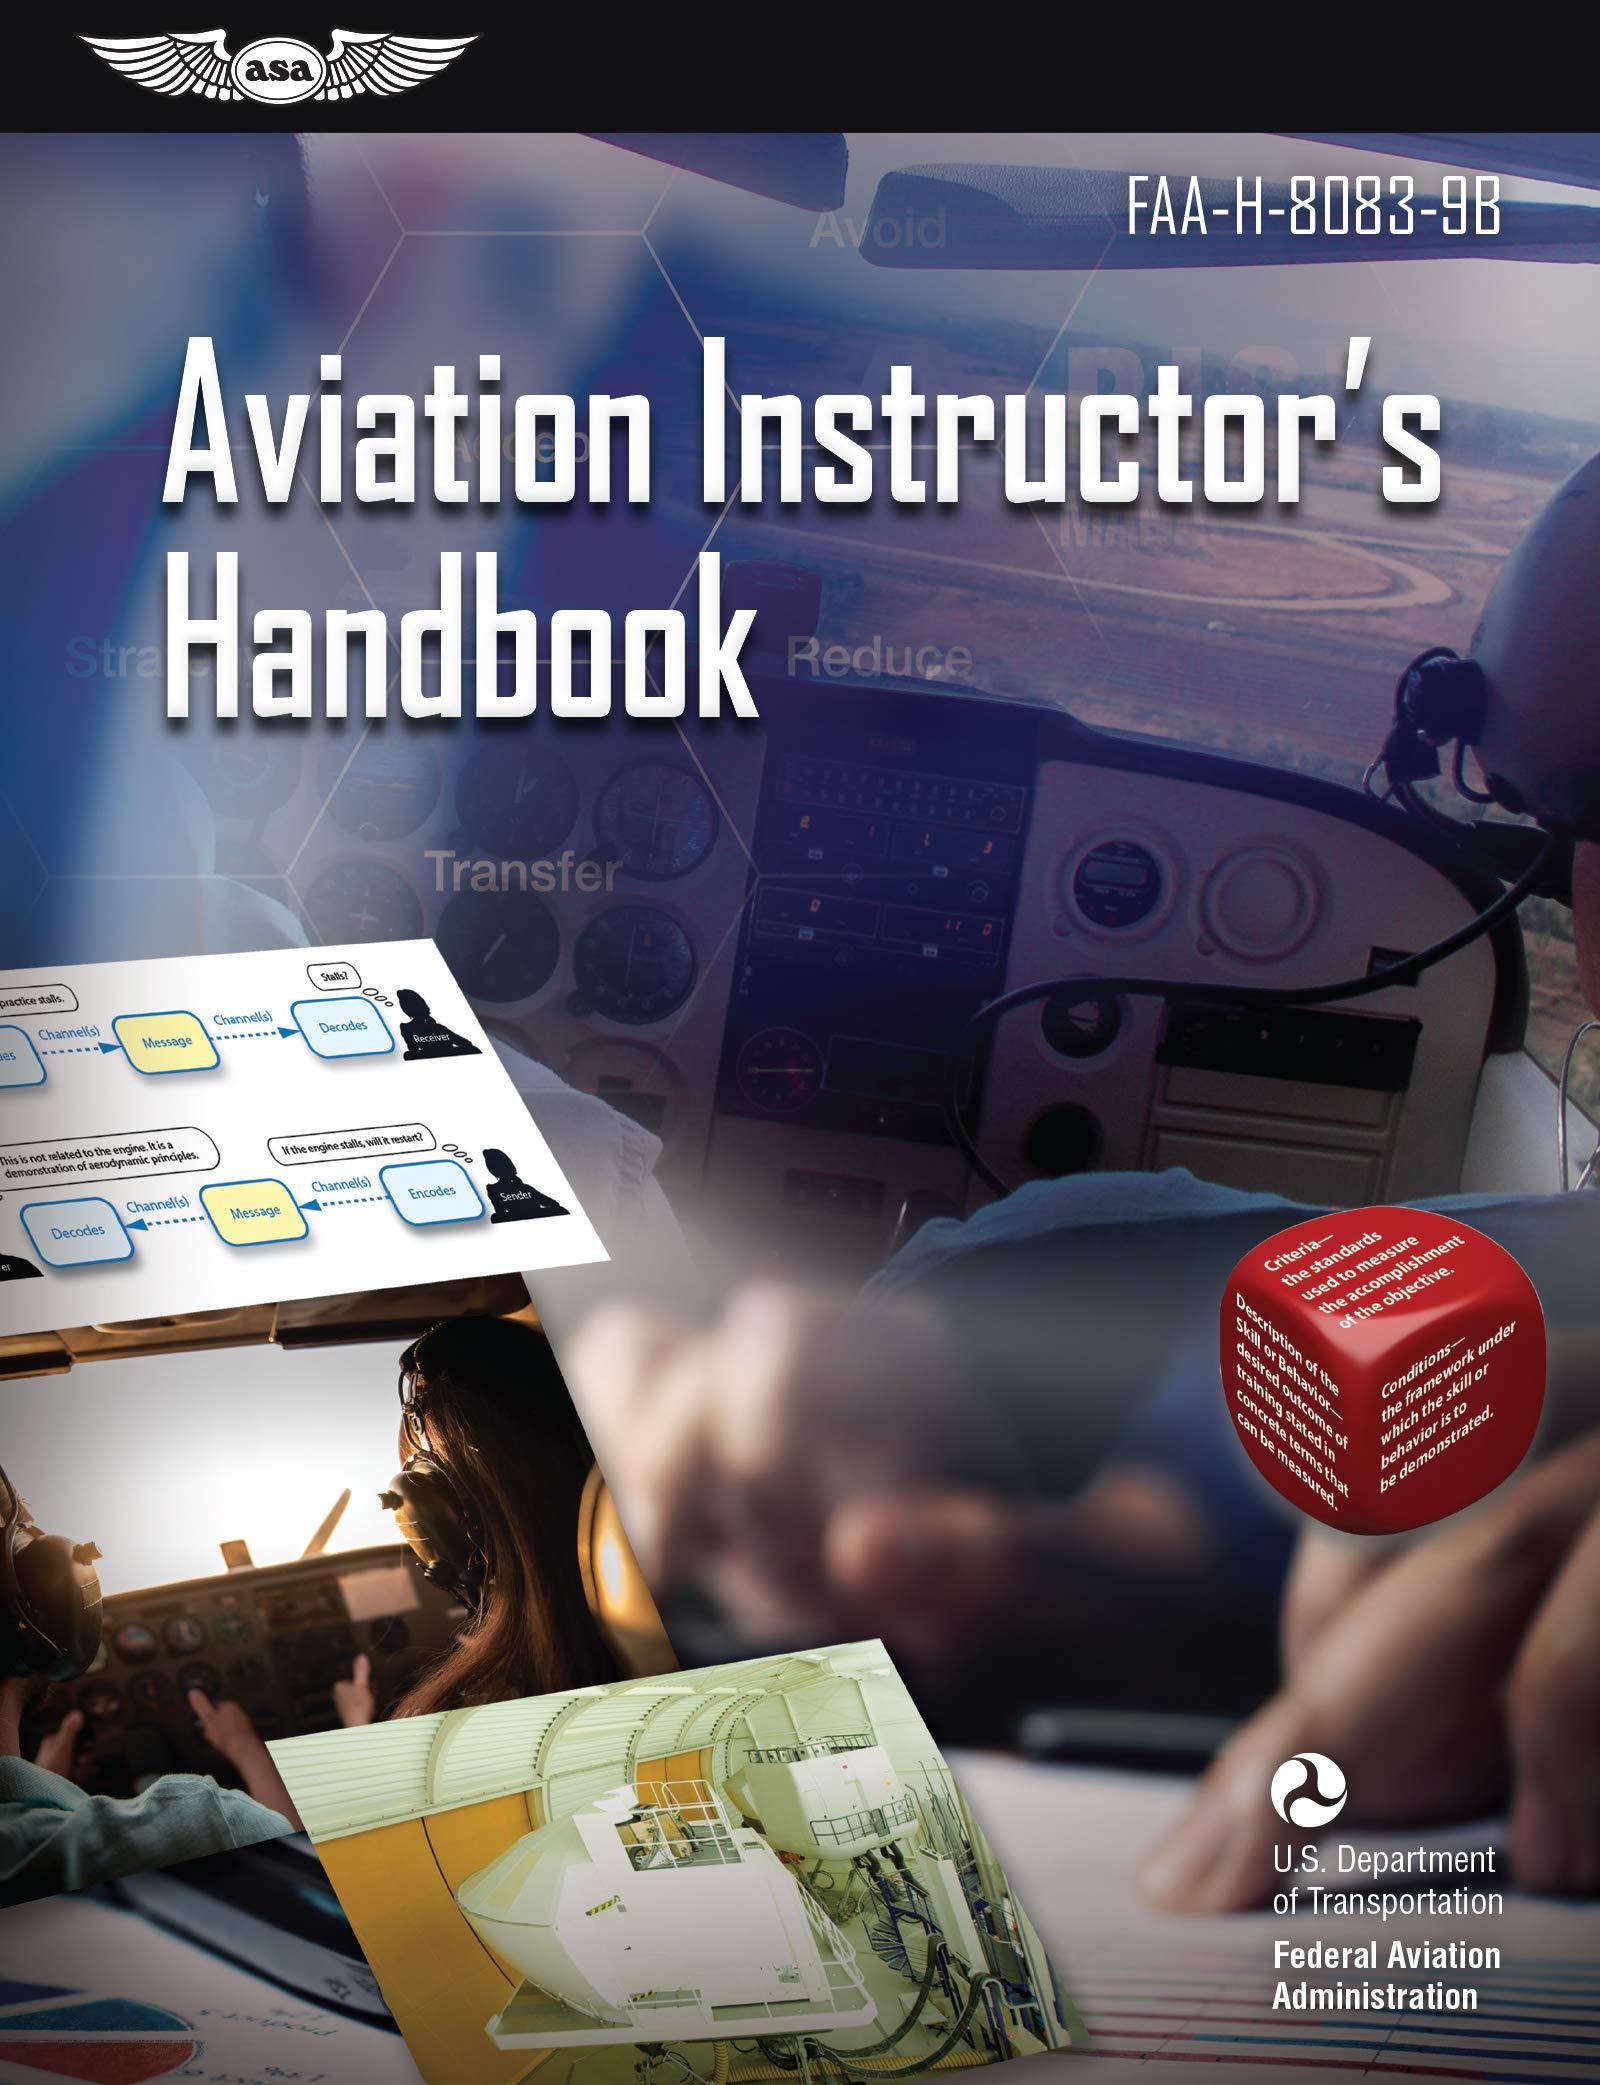 Aviation Instructor's Handbook: FAA-H-8083-9B (ASA FAA Handbook Series)